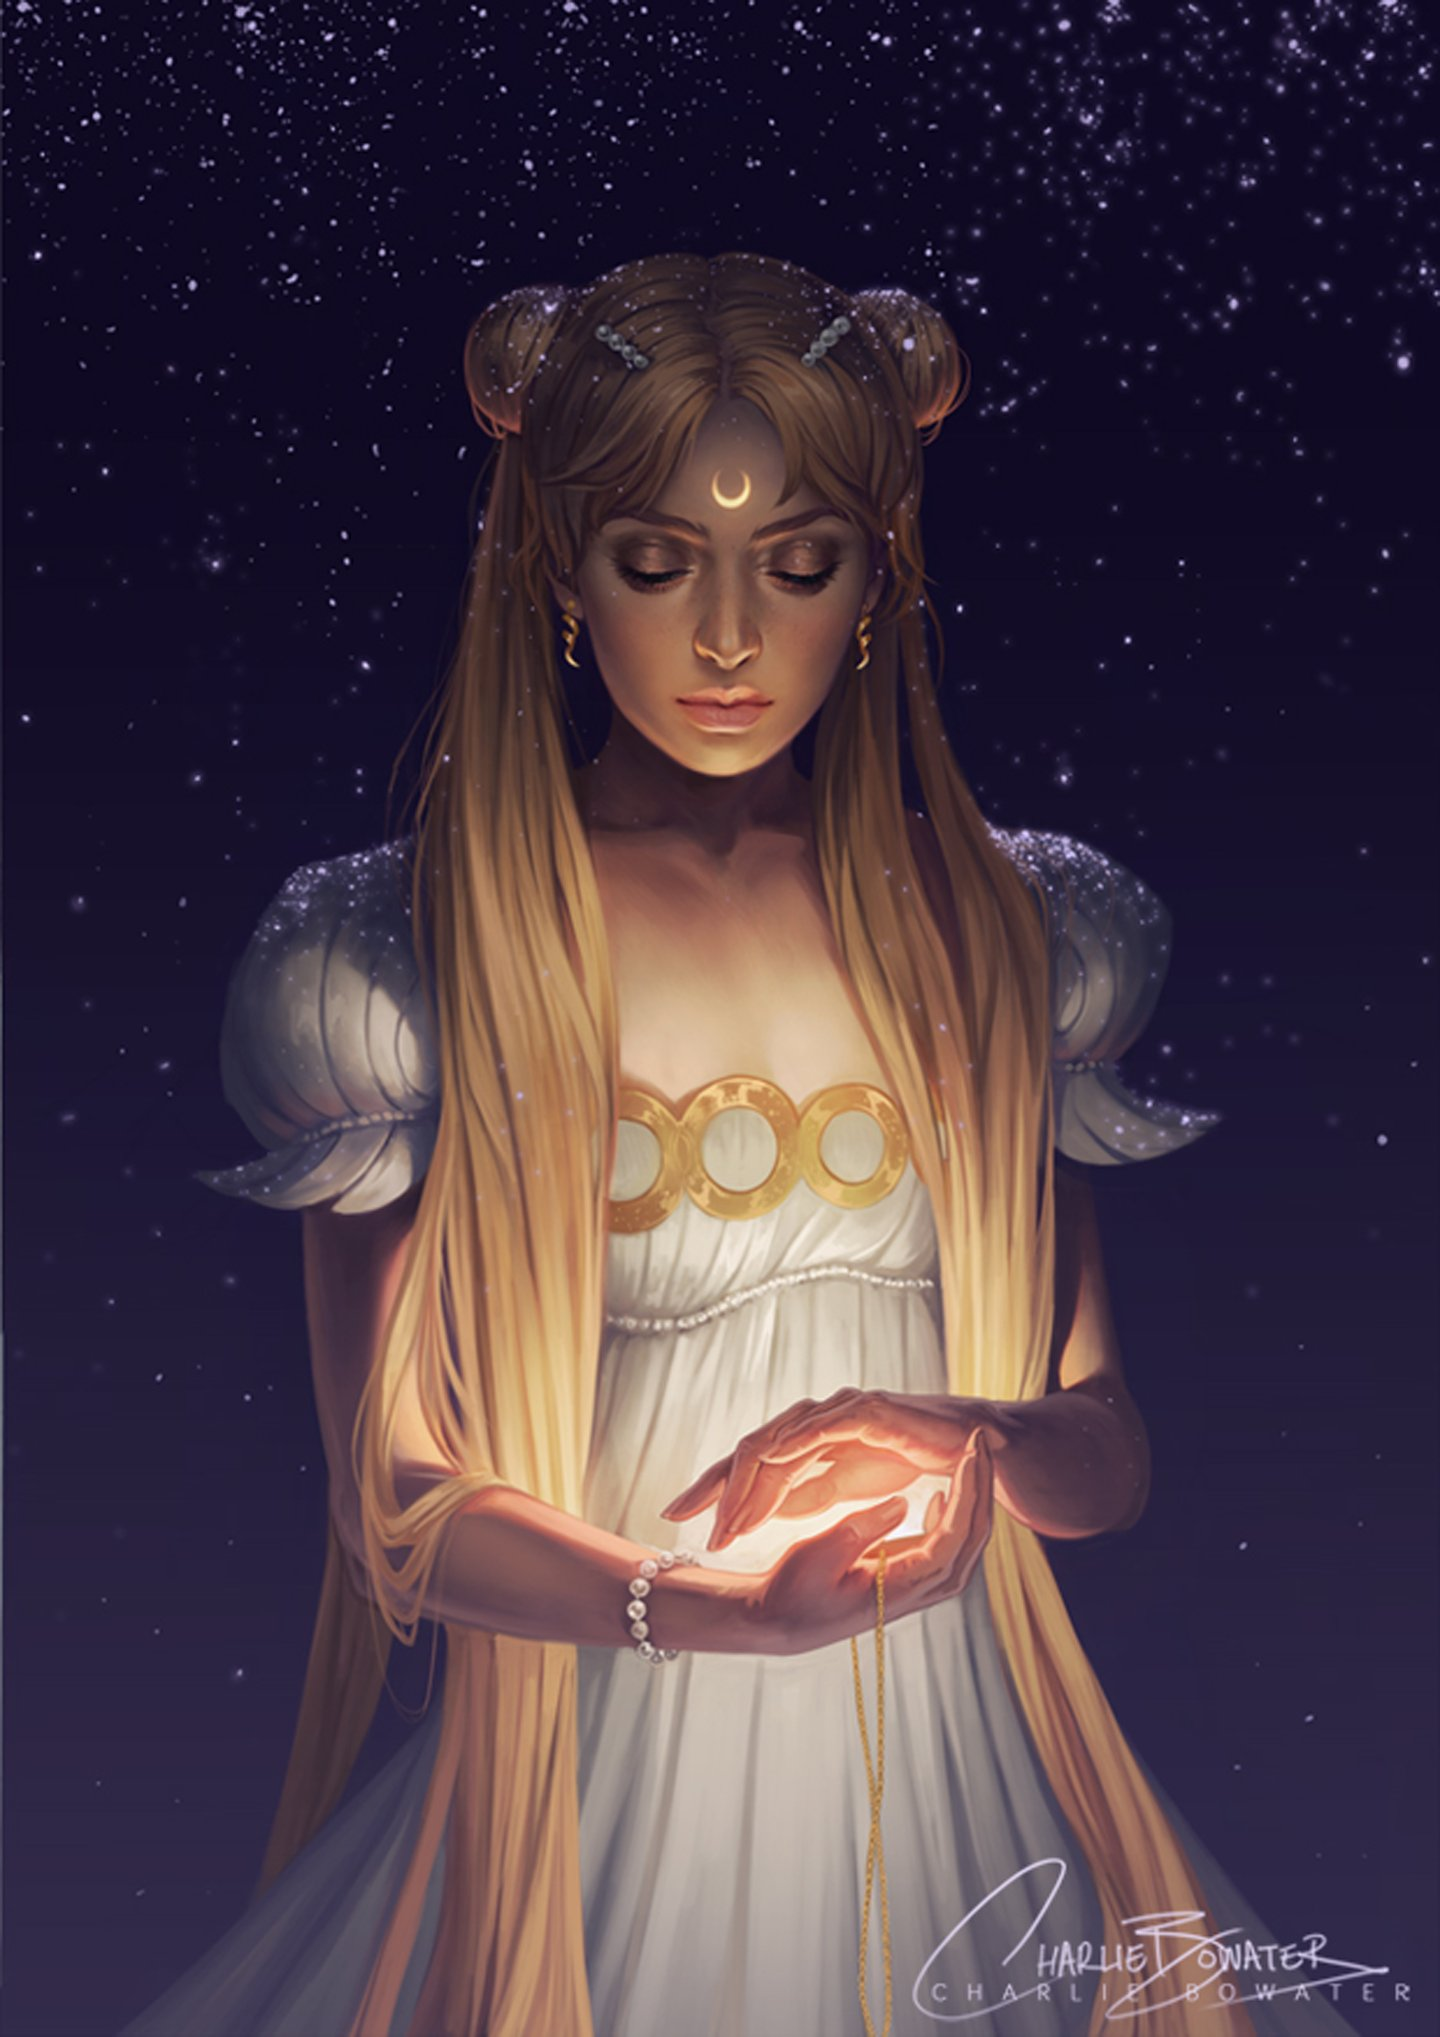 Sailor moon series character serenity dress sky star anime ...